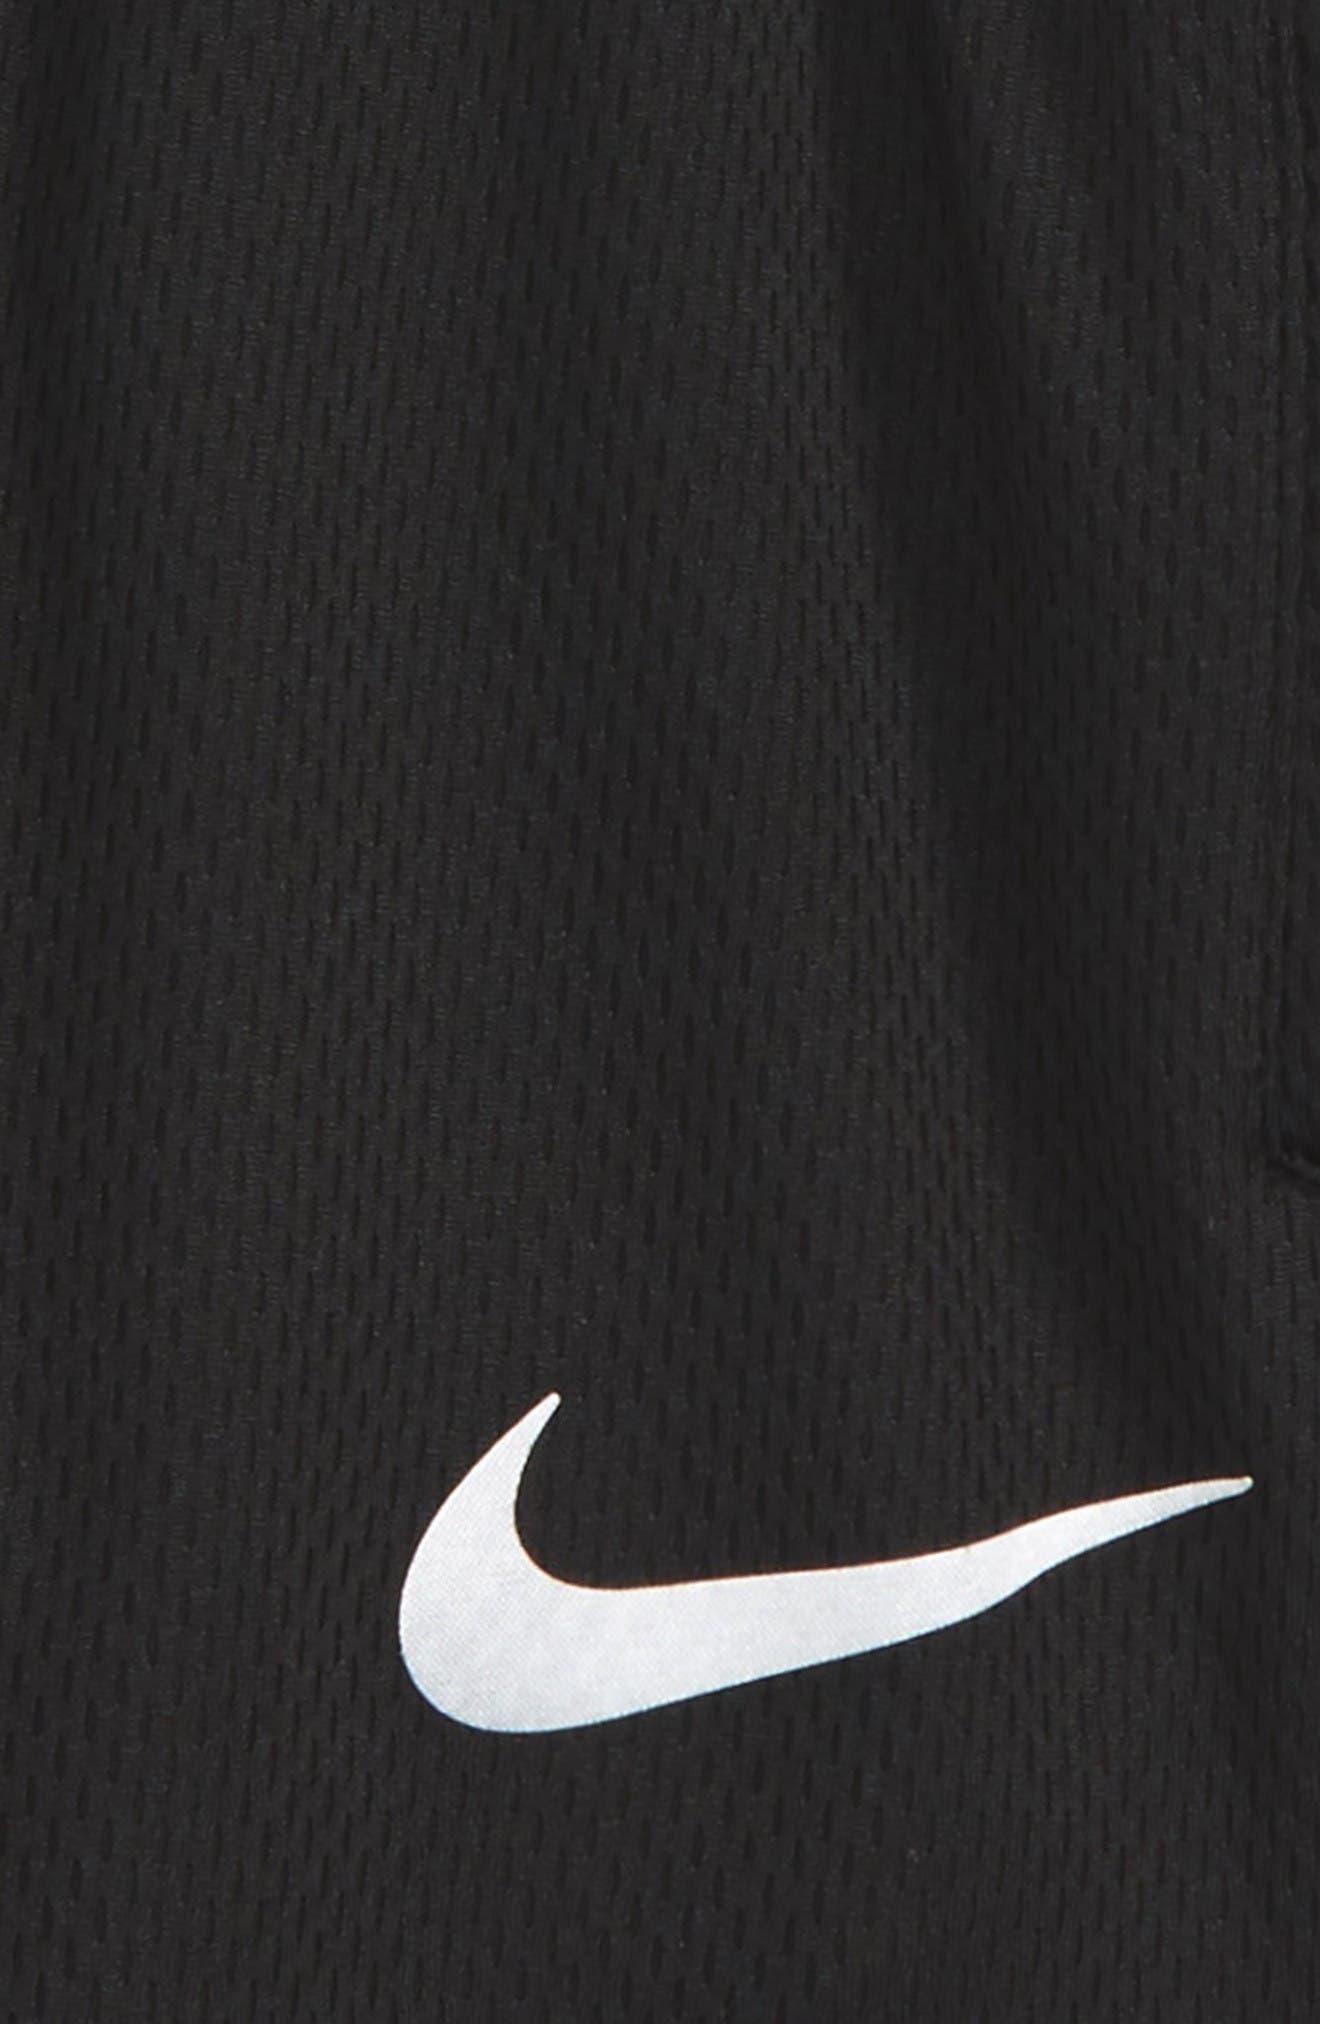 Elite Stripe Shorts,                             Alternate thumbnail 2, color,                             Black Denim